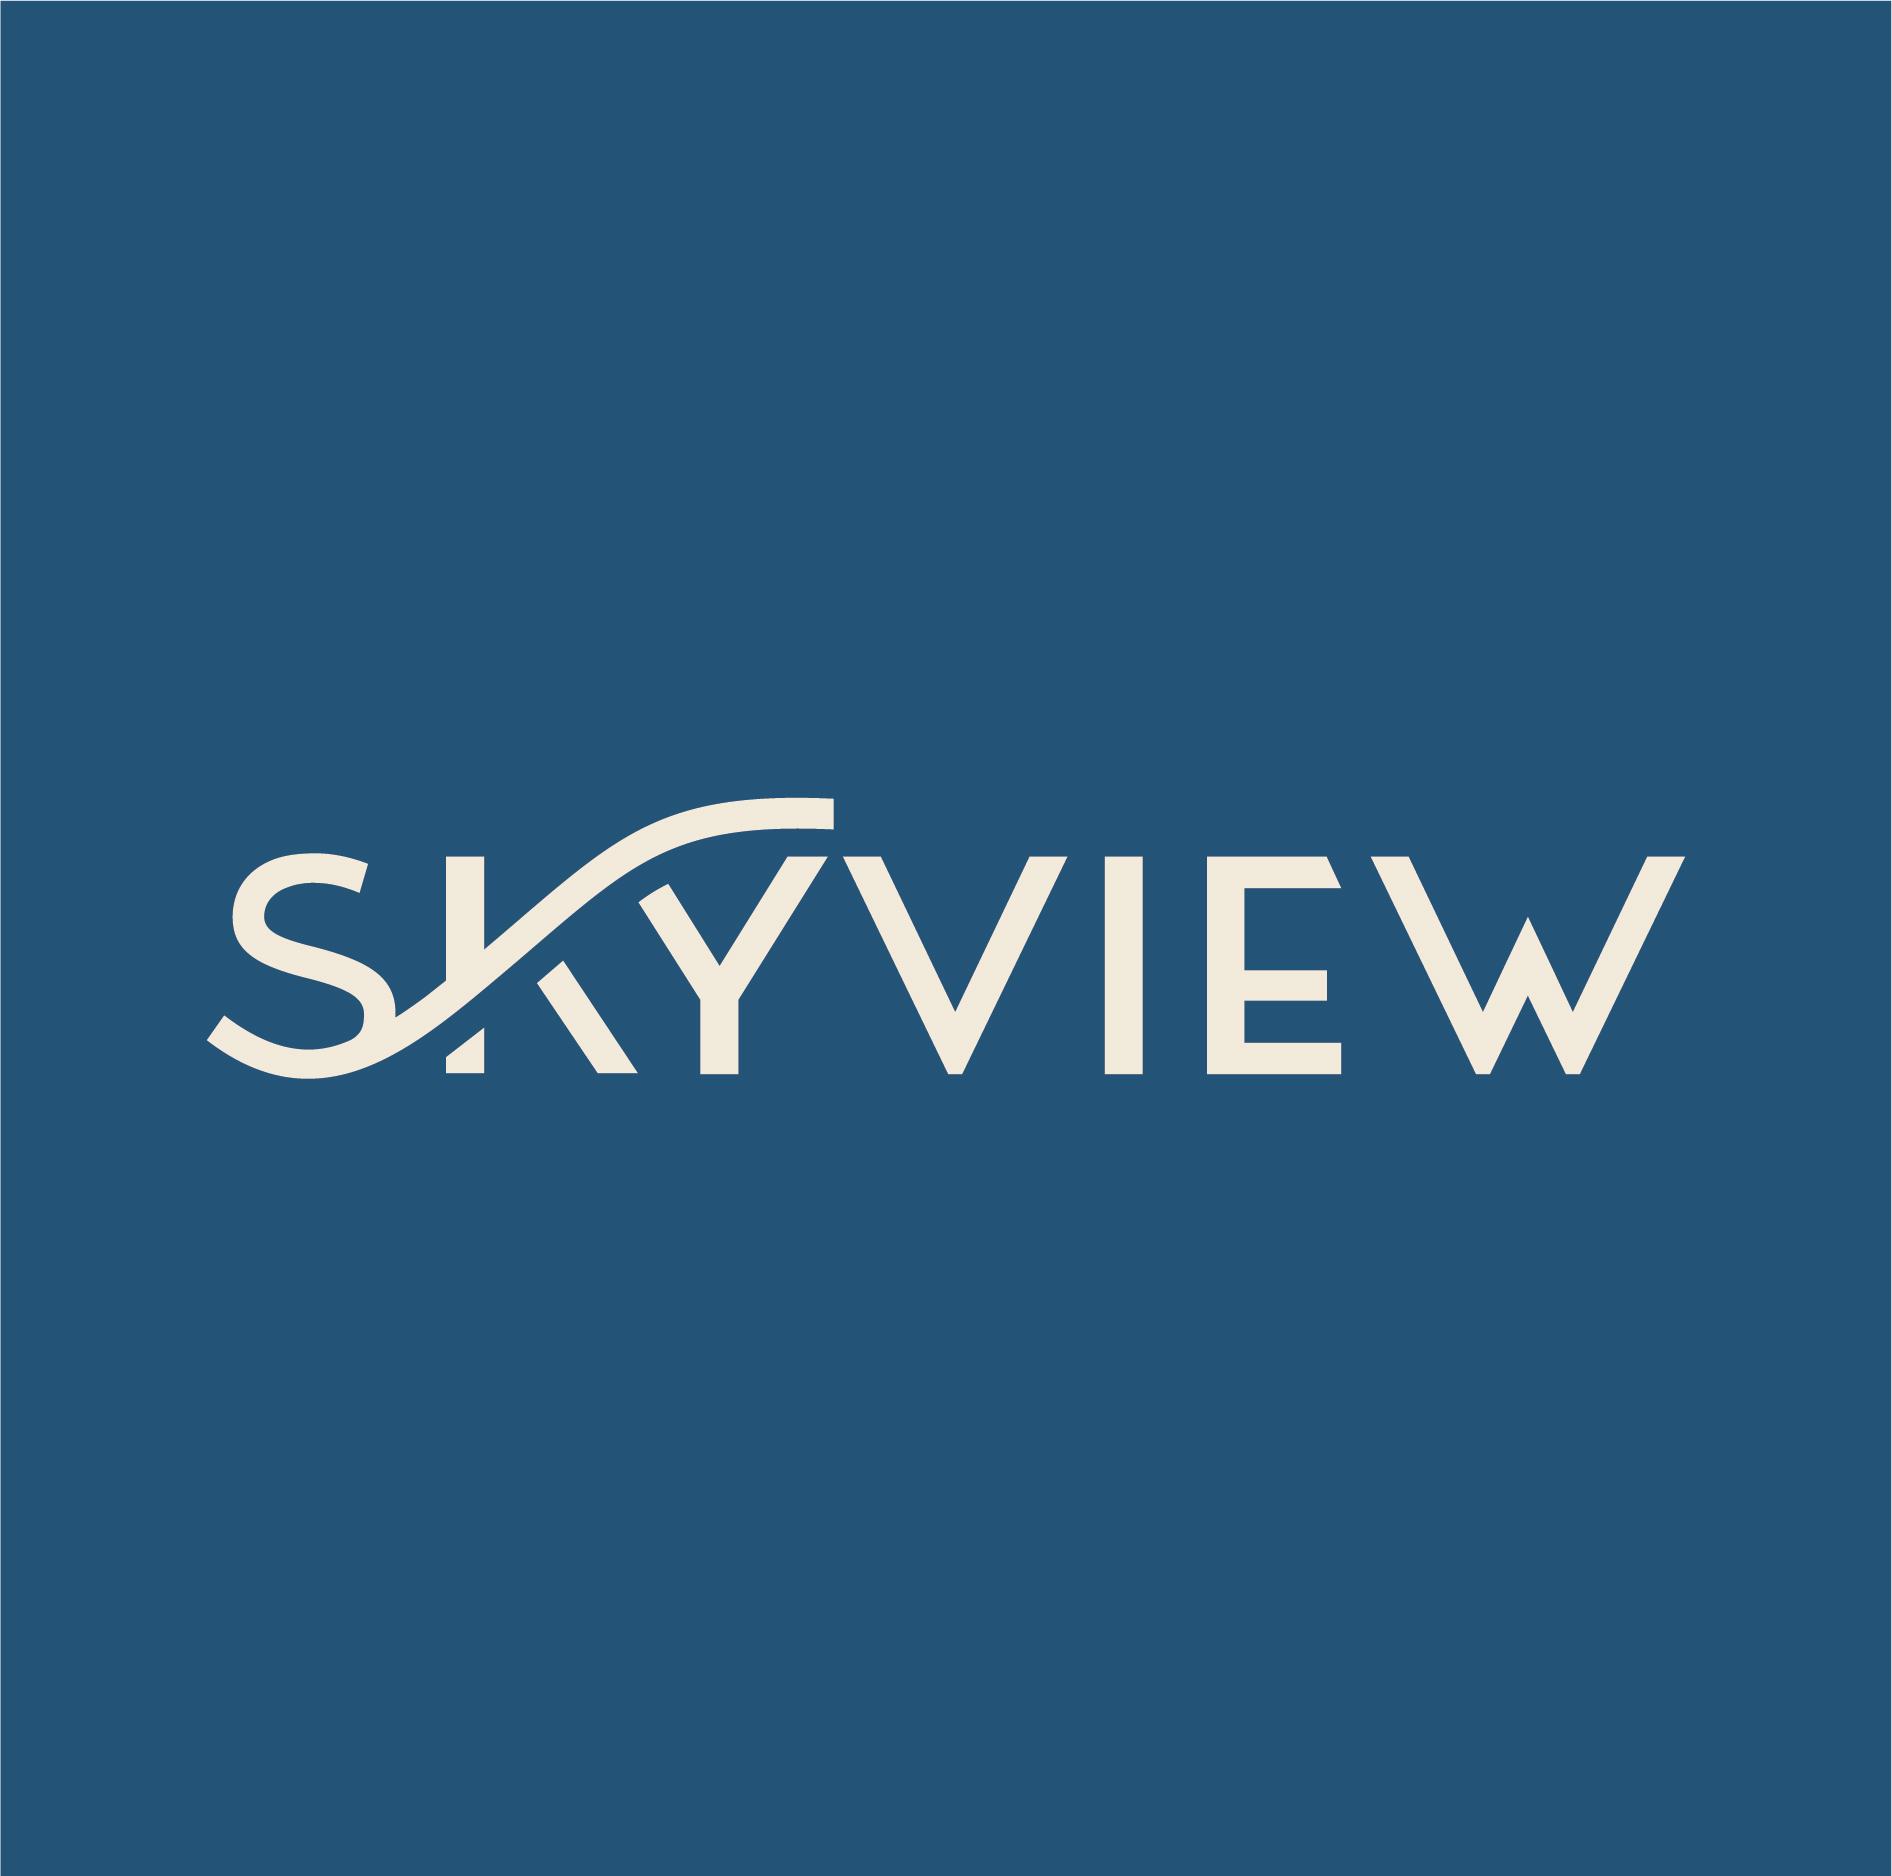 skyview logo